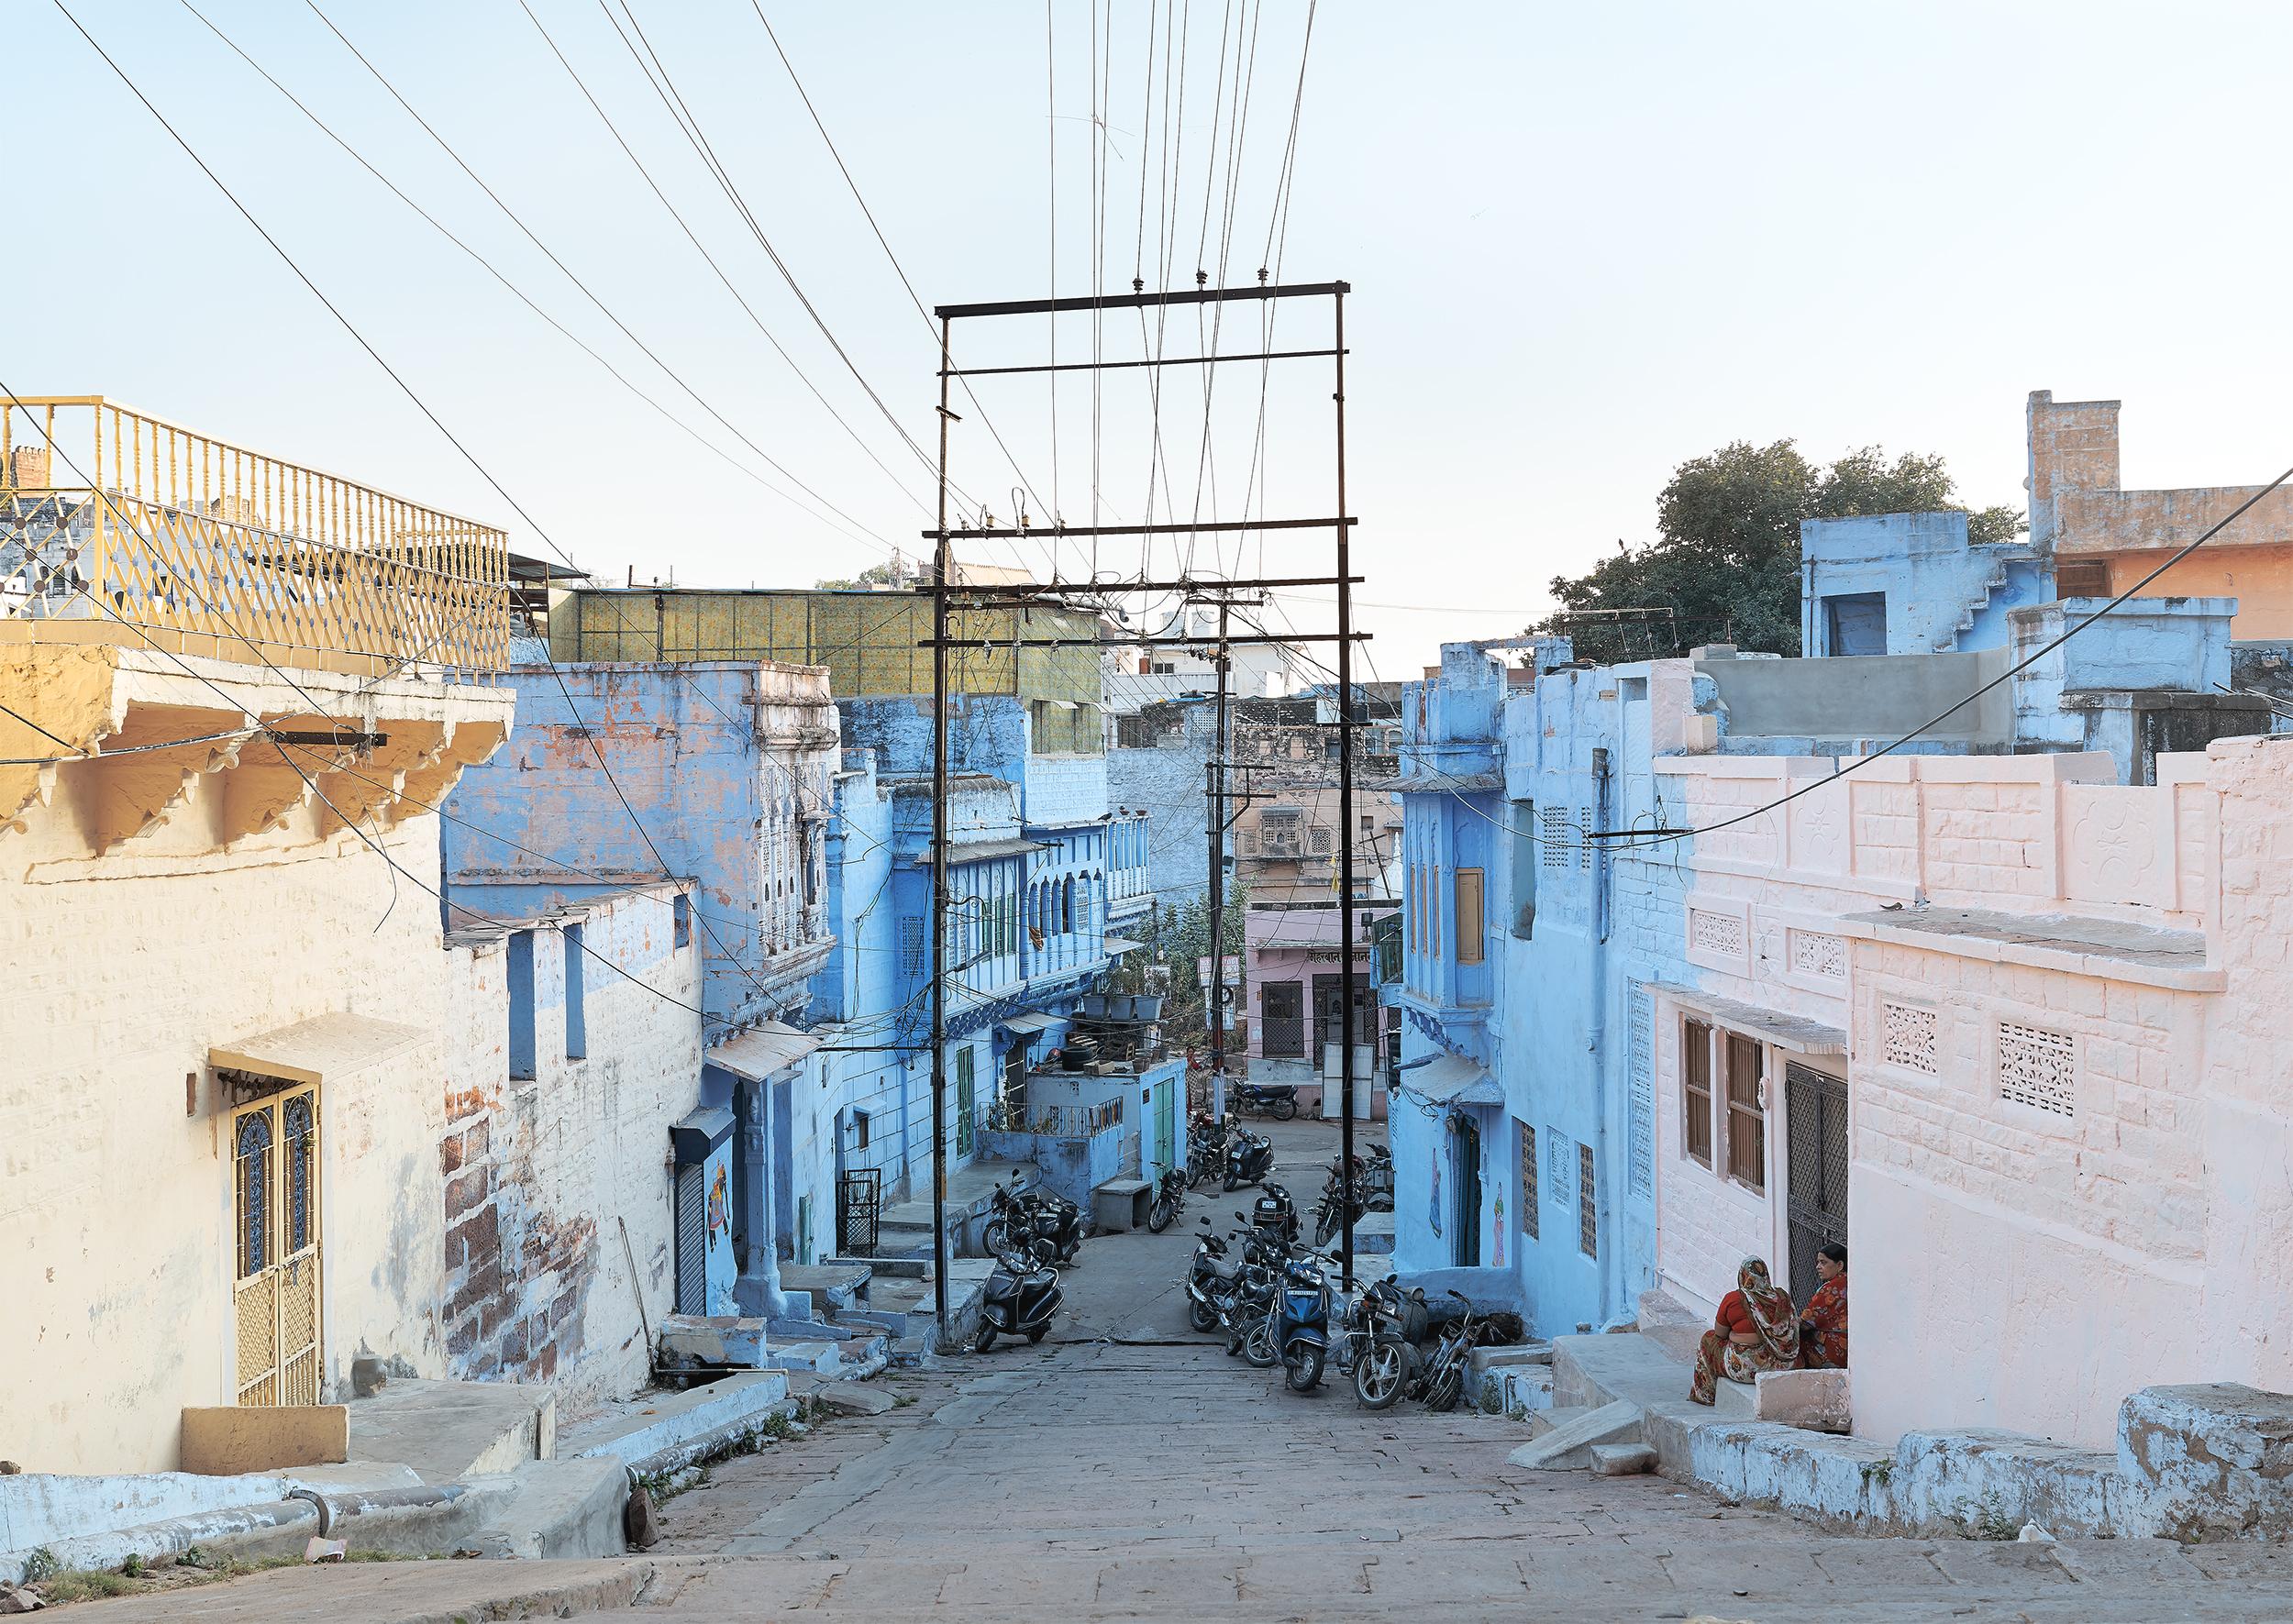 Blue Street, Jodhpur, India, 2017